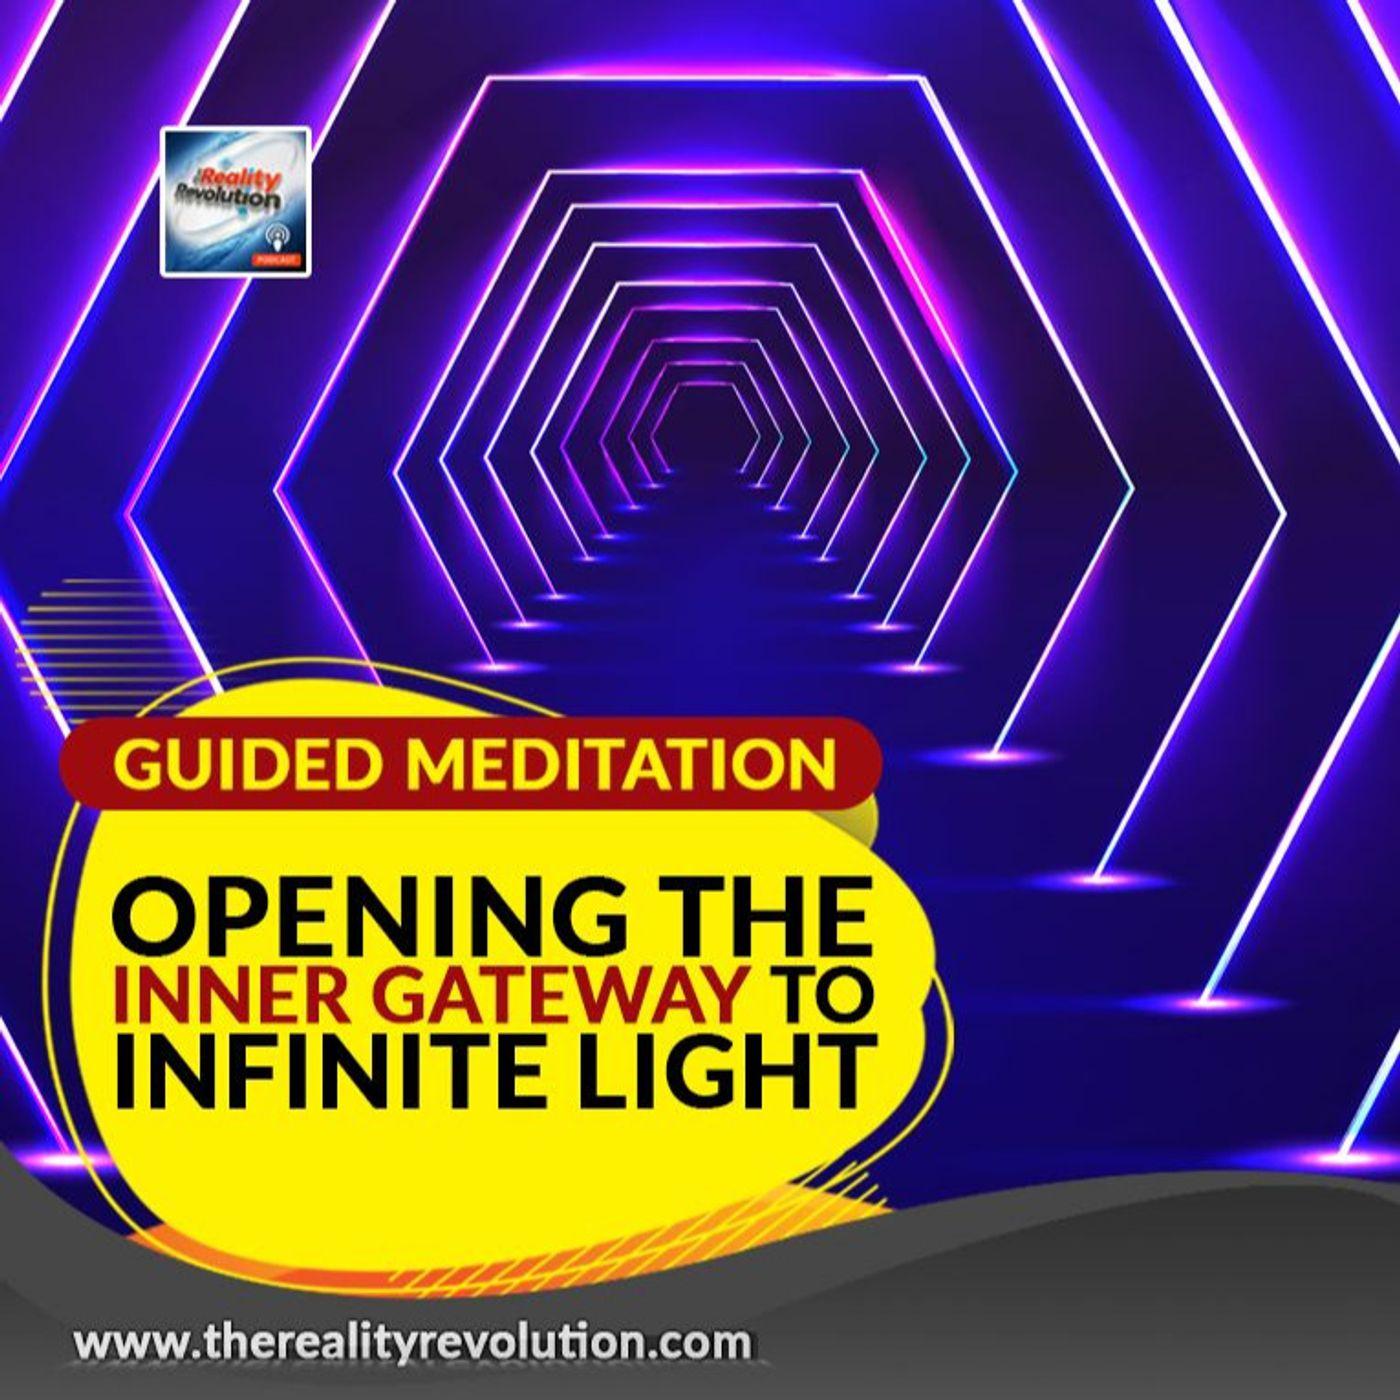 Guided Meditation Opening The Inner Gateway To Infinite light